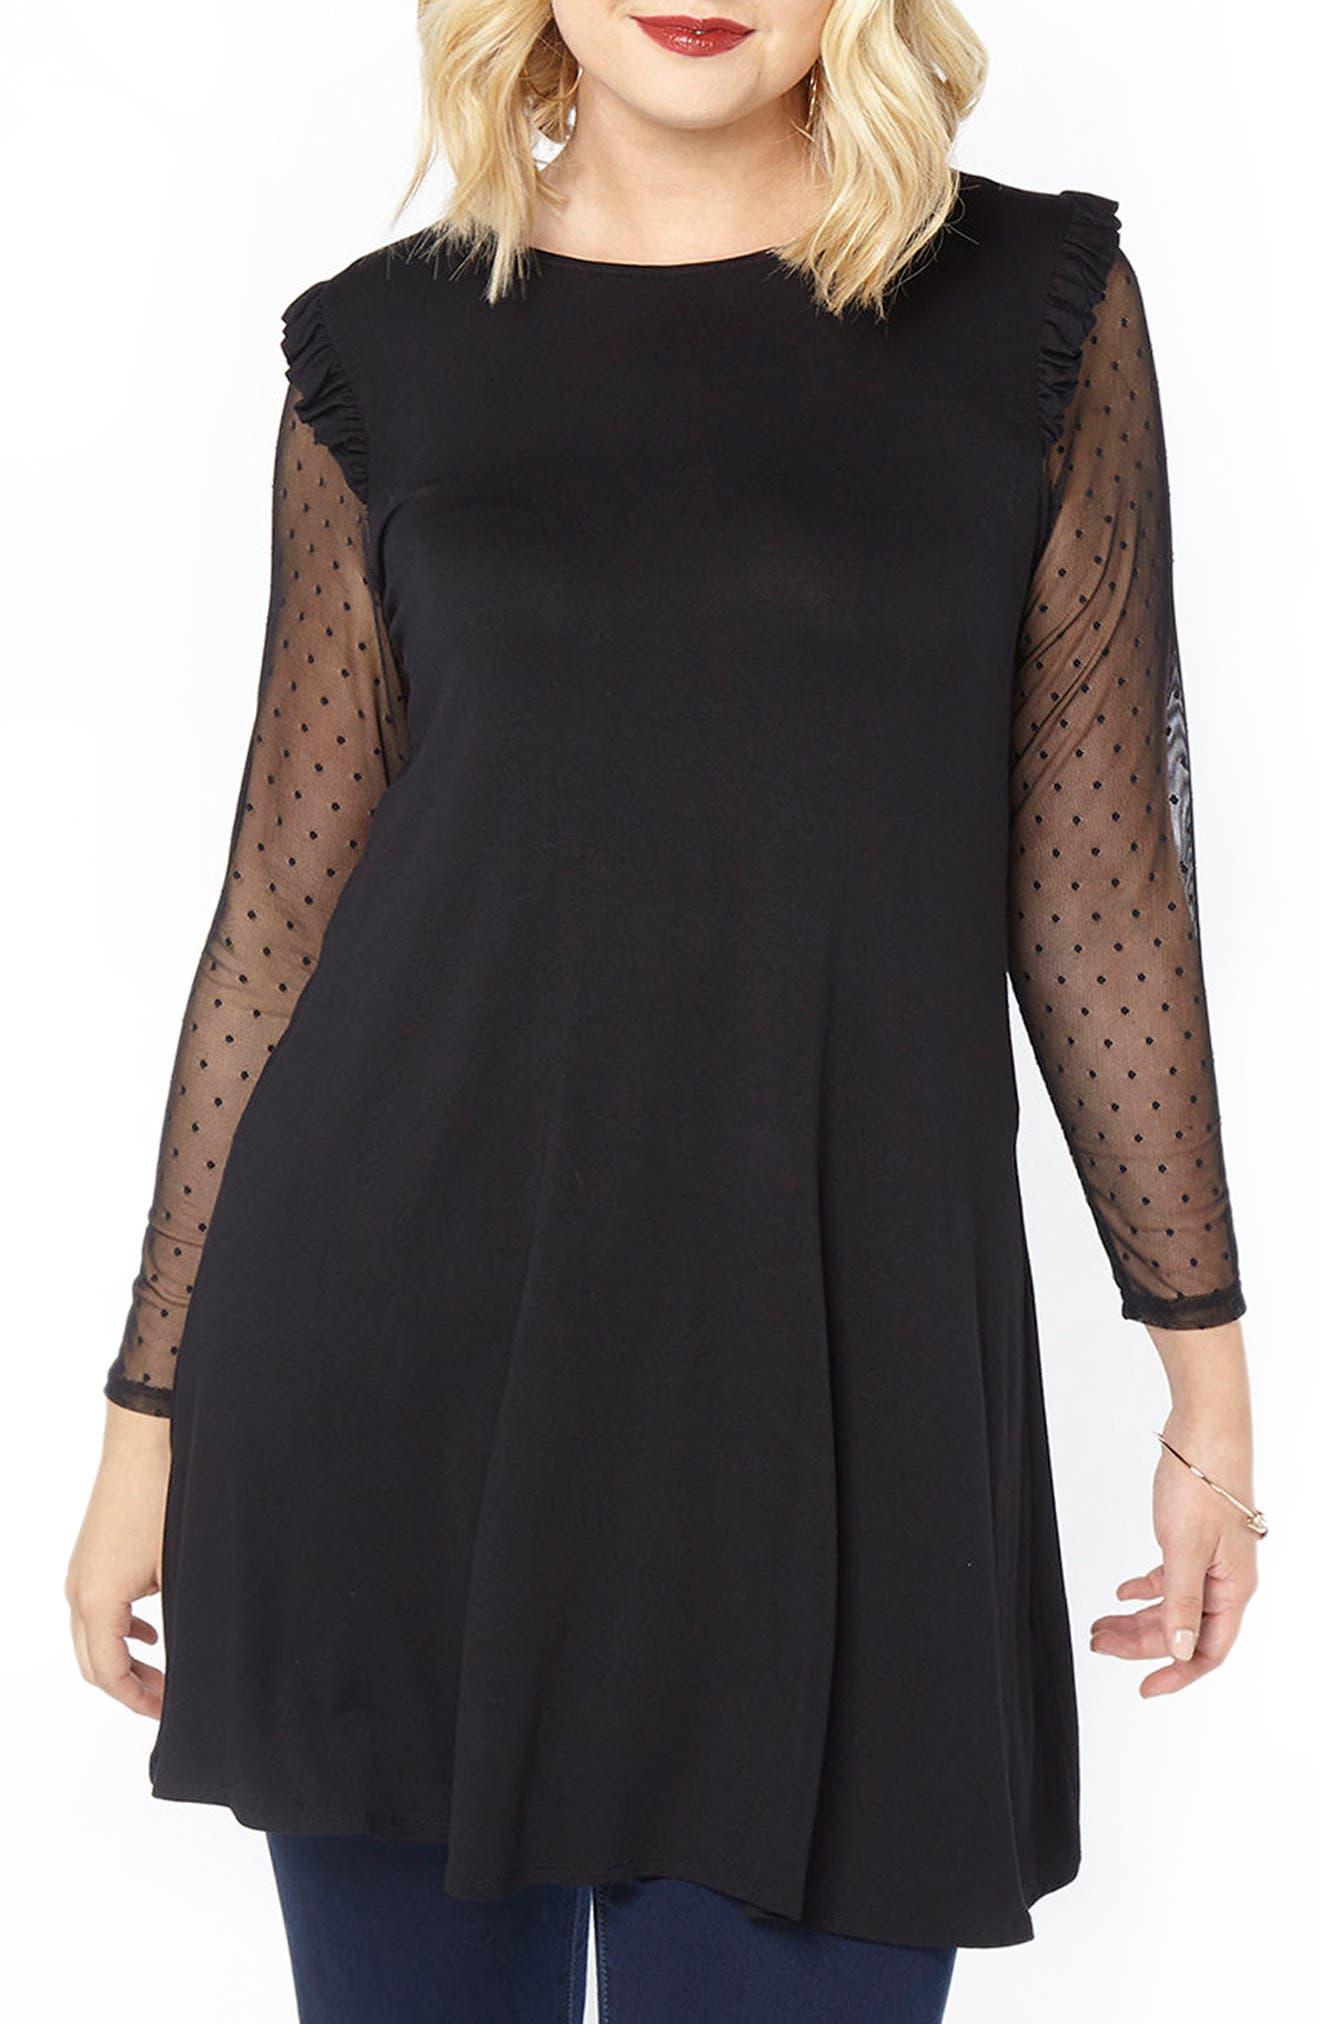 Mesh Sleeve Tunic,                         Main,                         color, Black